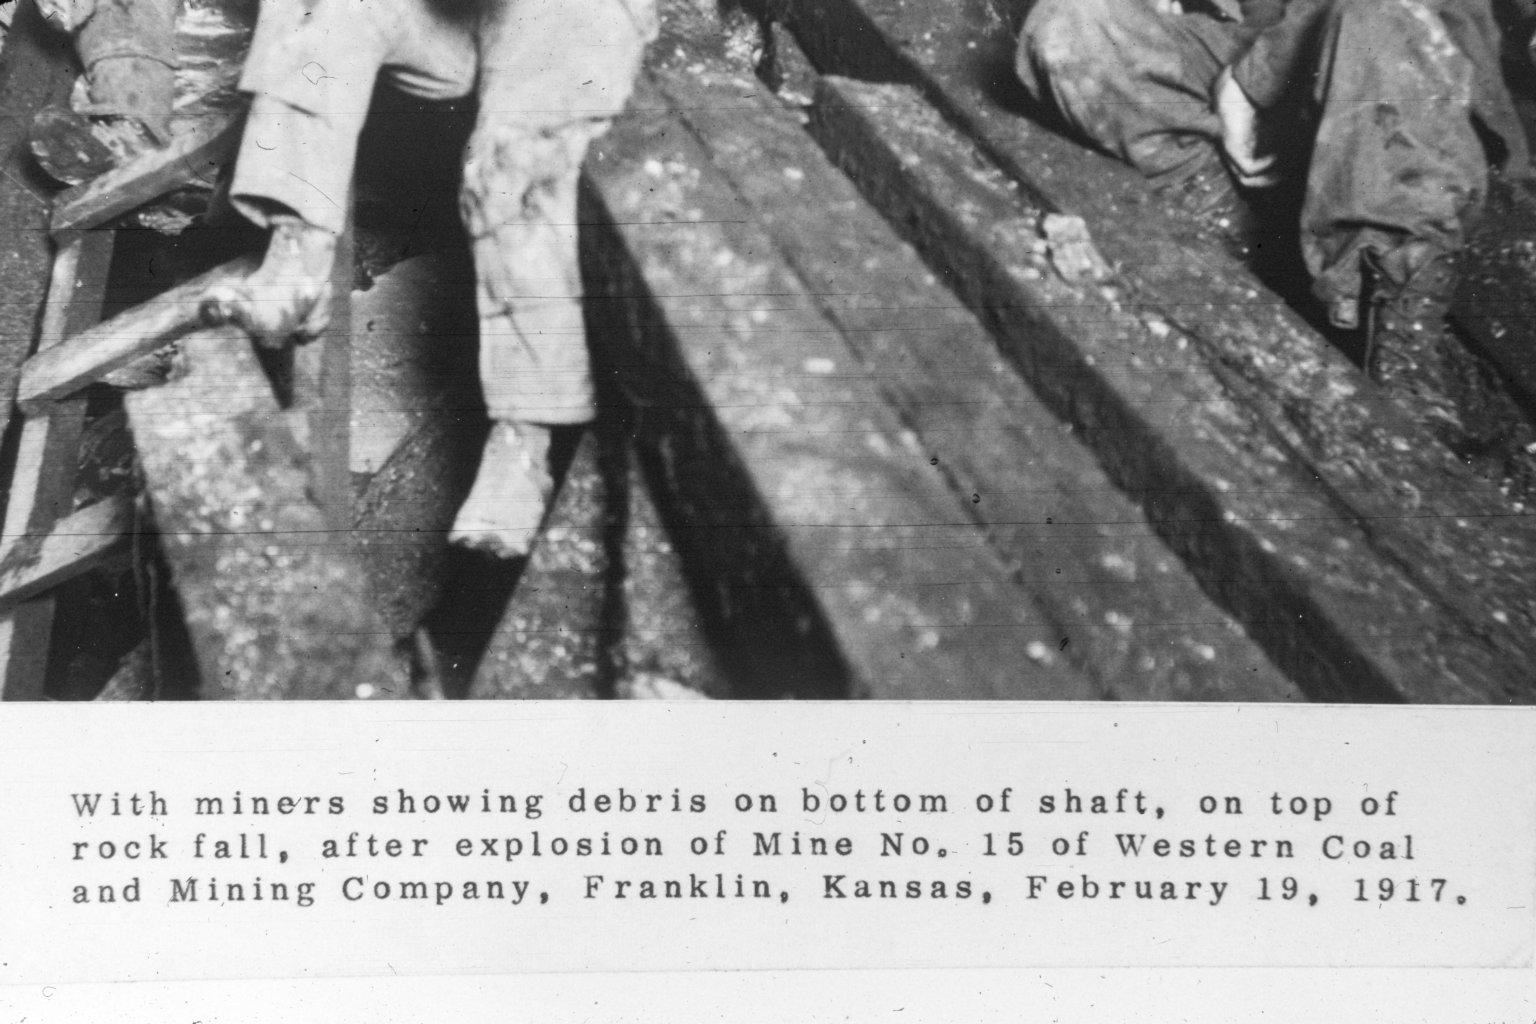 Franklin, Kansas 1917